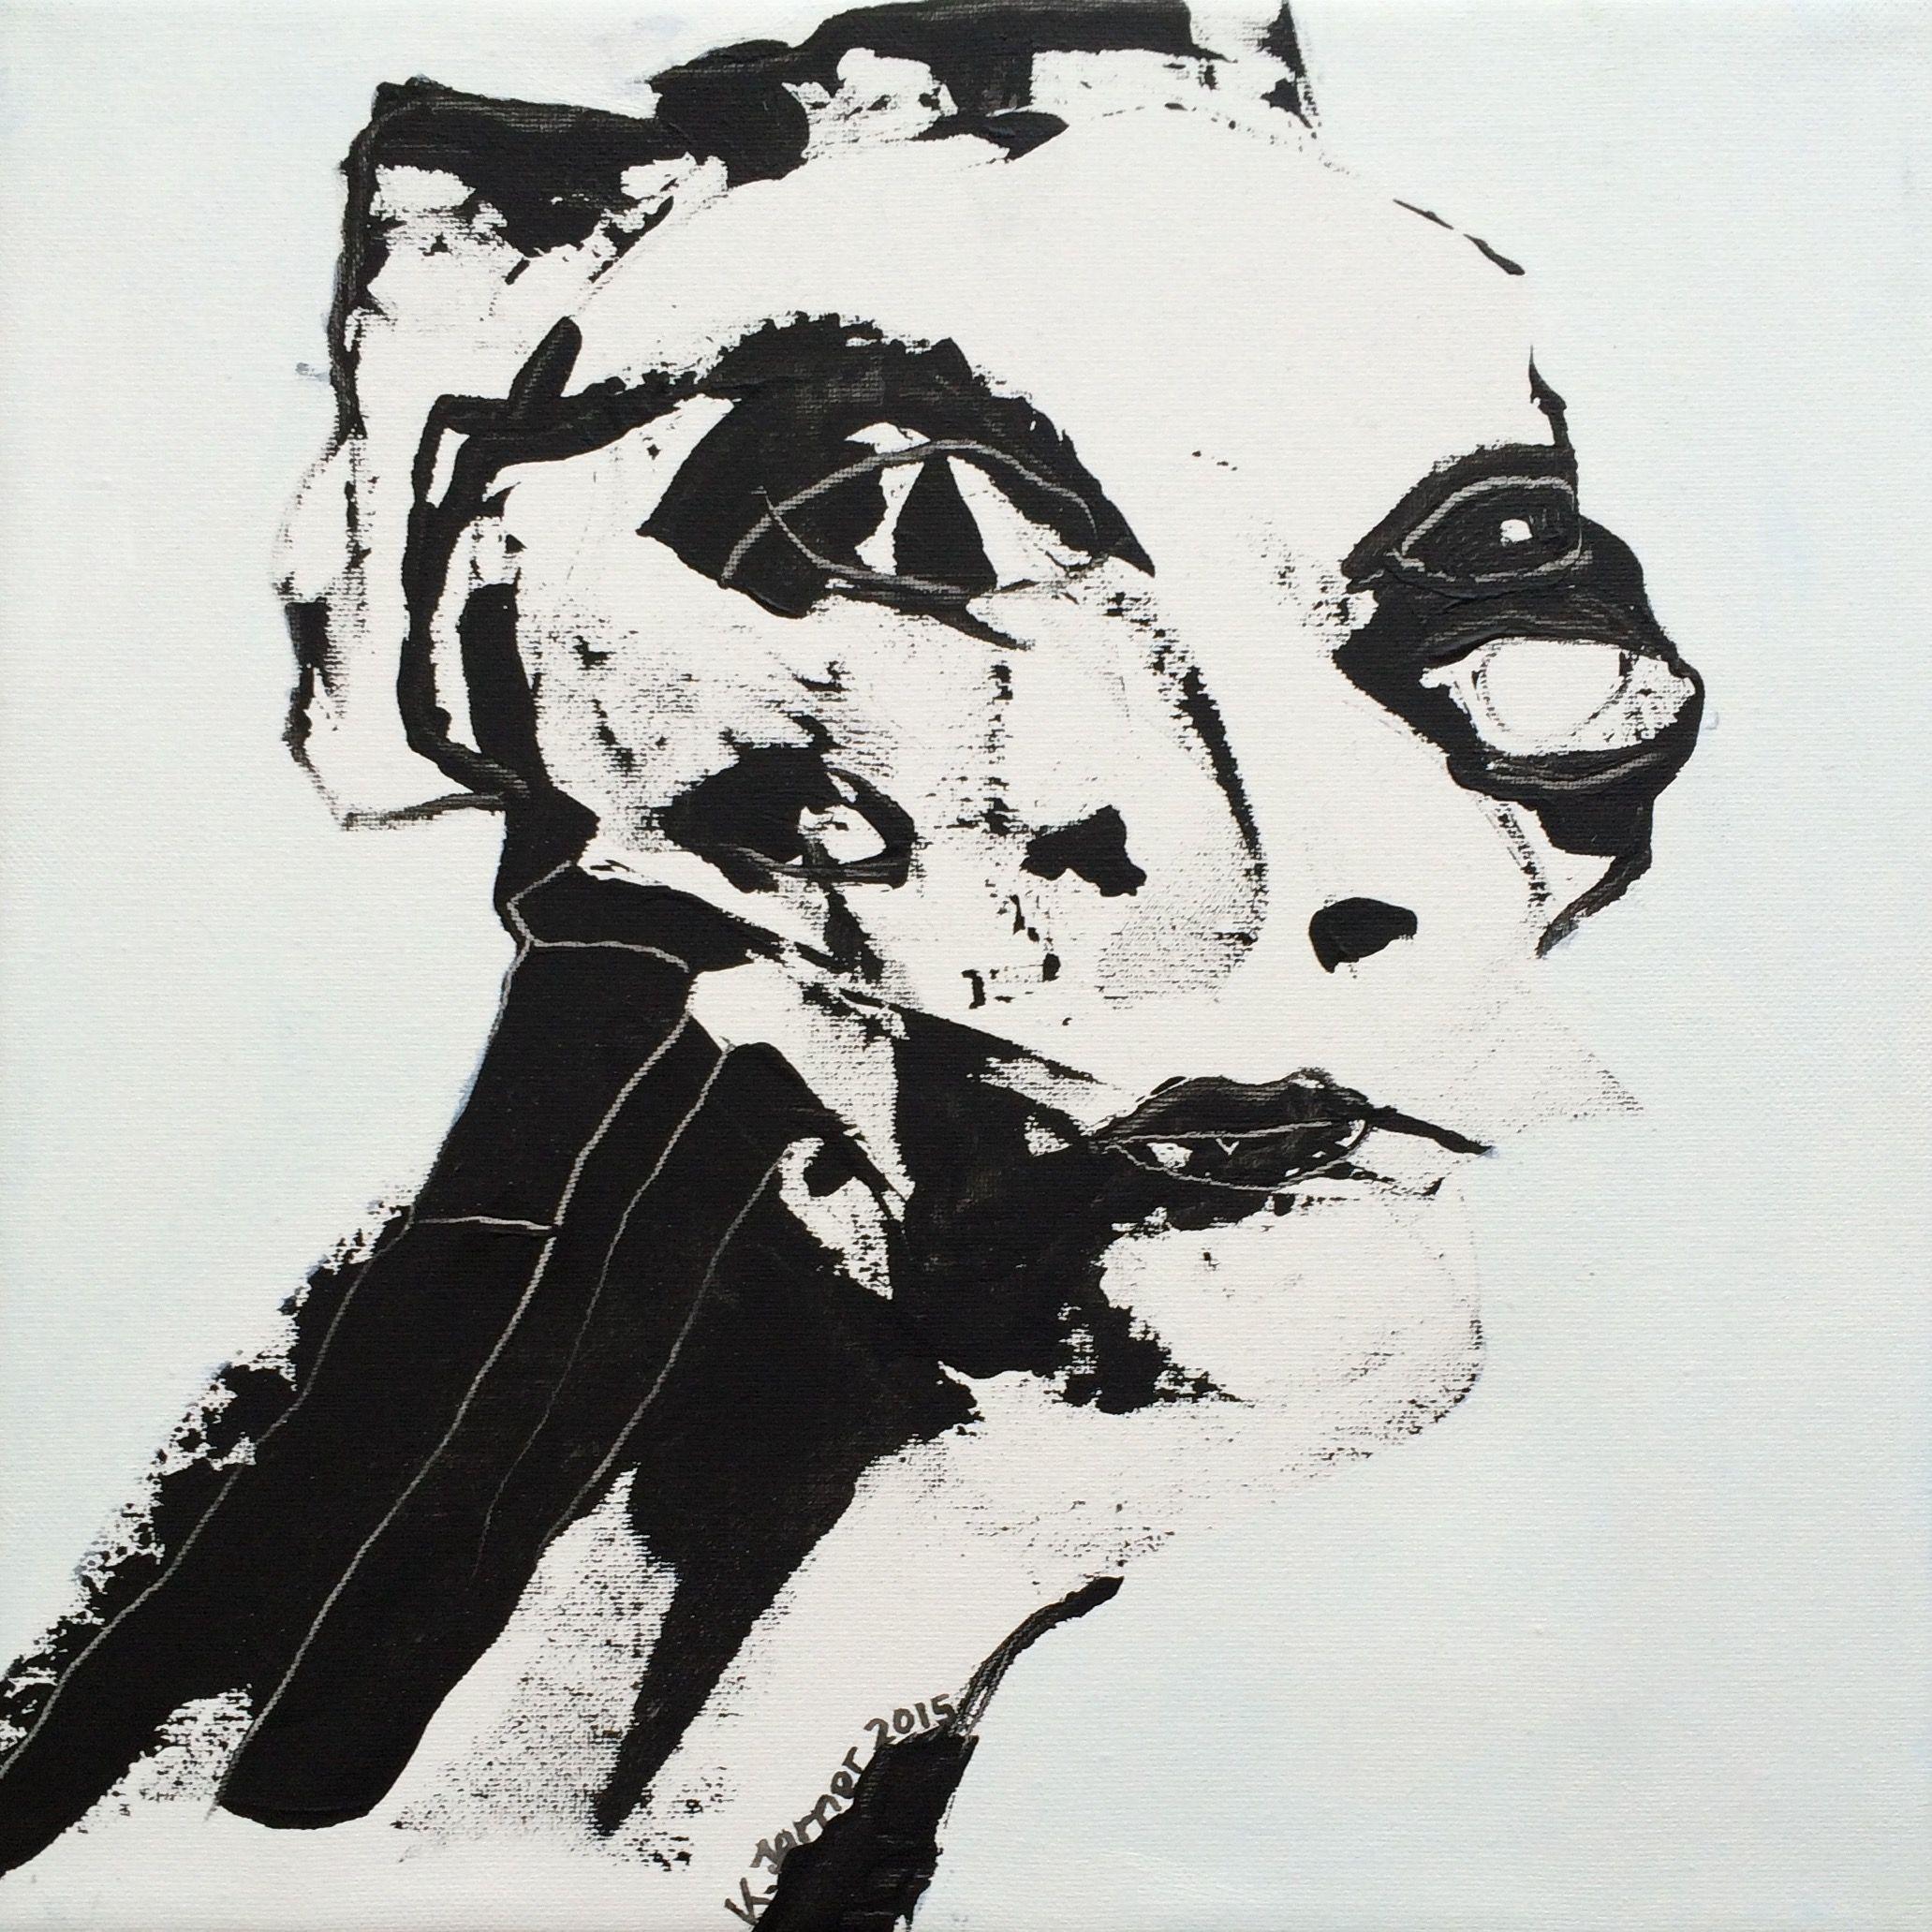 'Alien'. Kell Jarner, 2015. 28x28 cm.